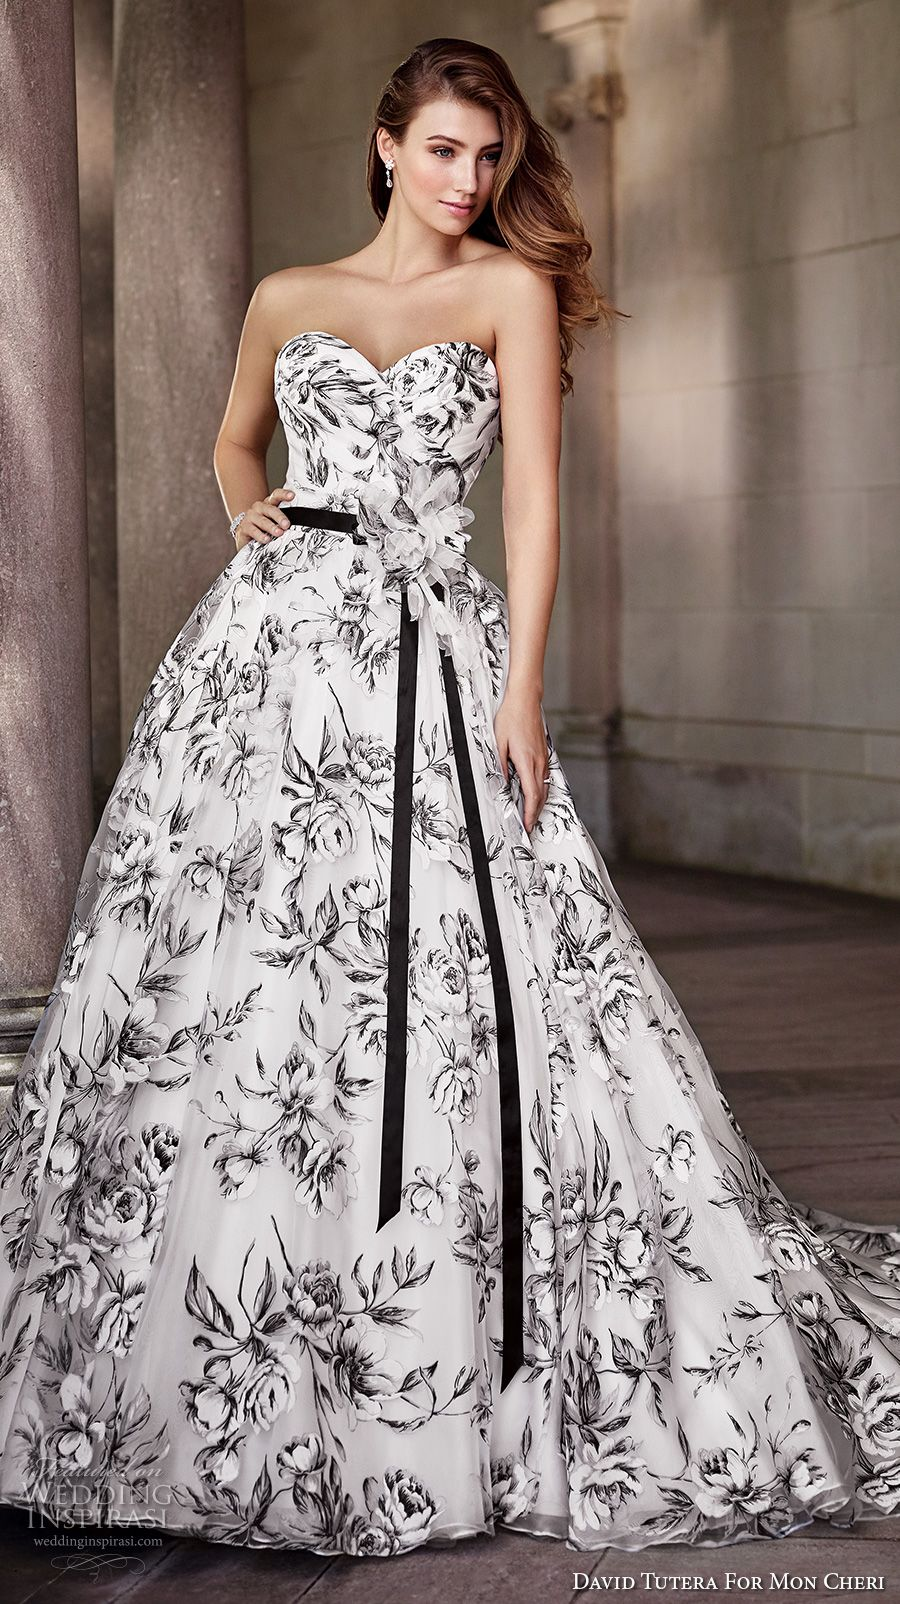 Floral print wedding dresses  David Tutera for Mon Cheri Spring  Wedding Dresses  Romantic